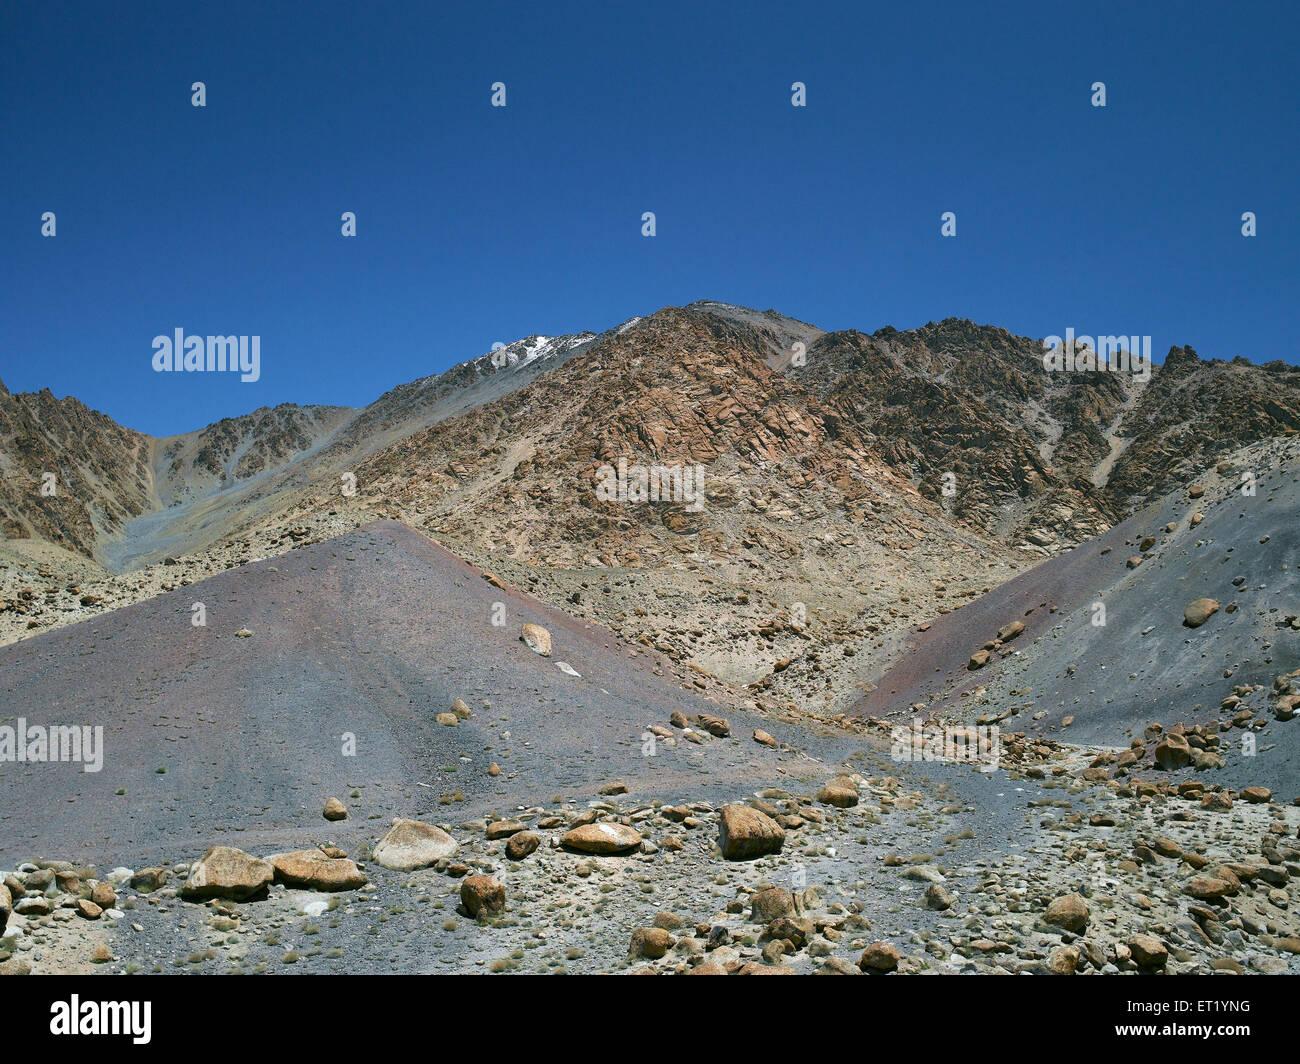 Hillside ; Tingmosgang ; Ladakh ; Jammu And Kashmir ; India ; Asia - Stock Image